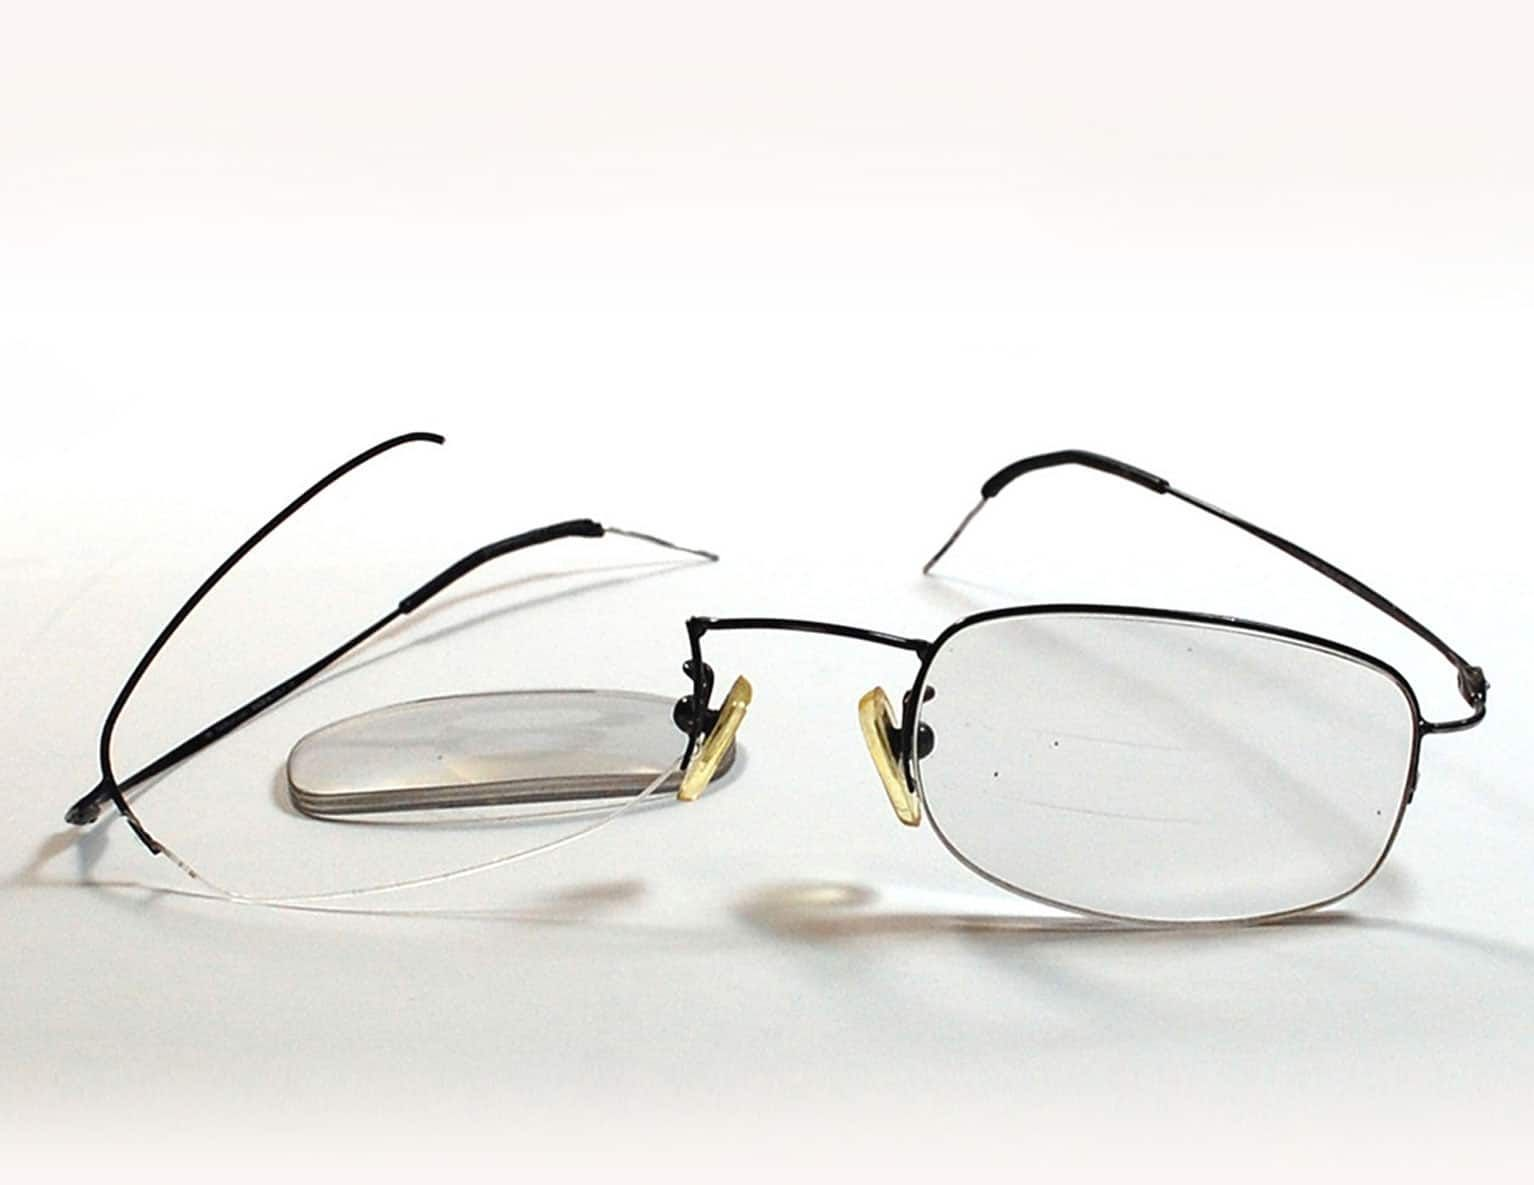 Fixmyglasses can repair over 95% of broken glasses, including ...